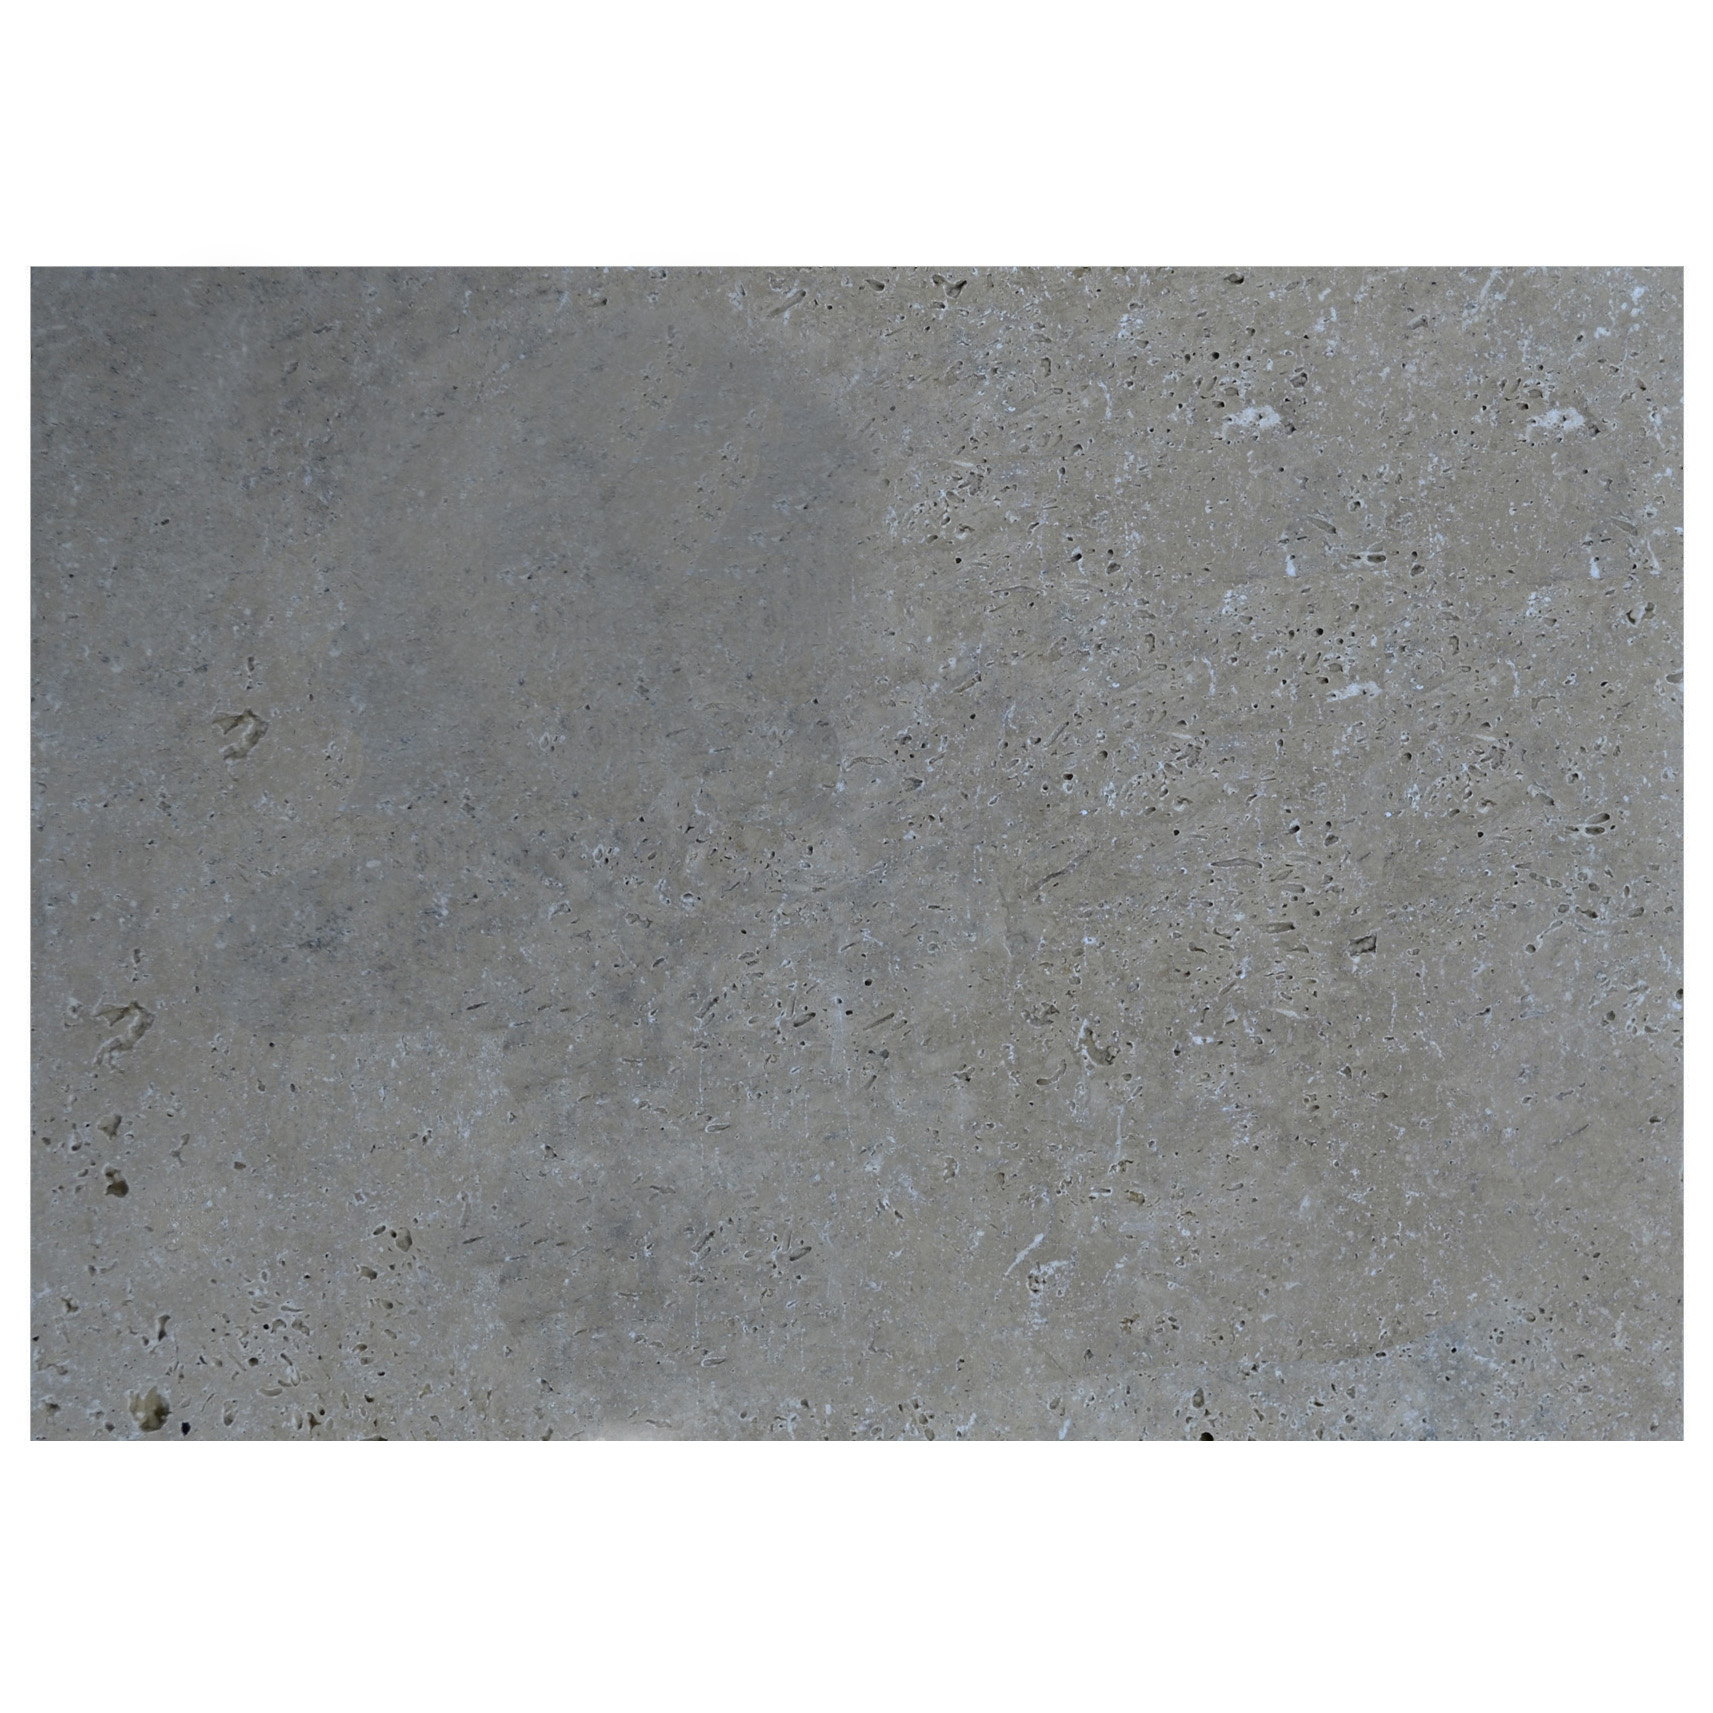 Noce Tumbled Travertine Pavers 16×24-pavers sale-Atlantic Stone Source